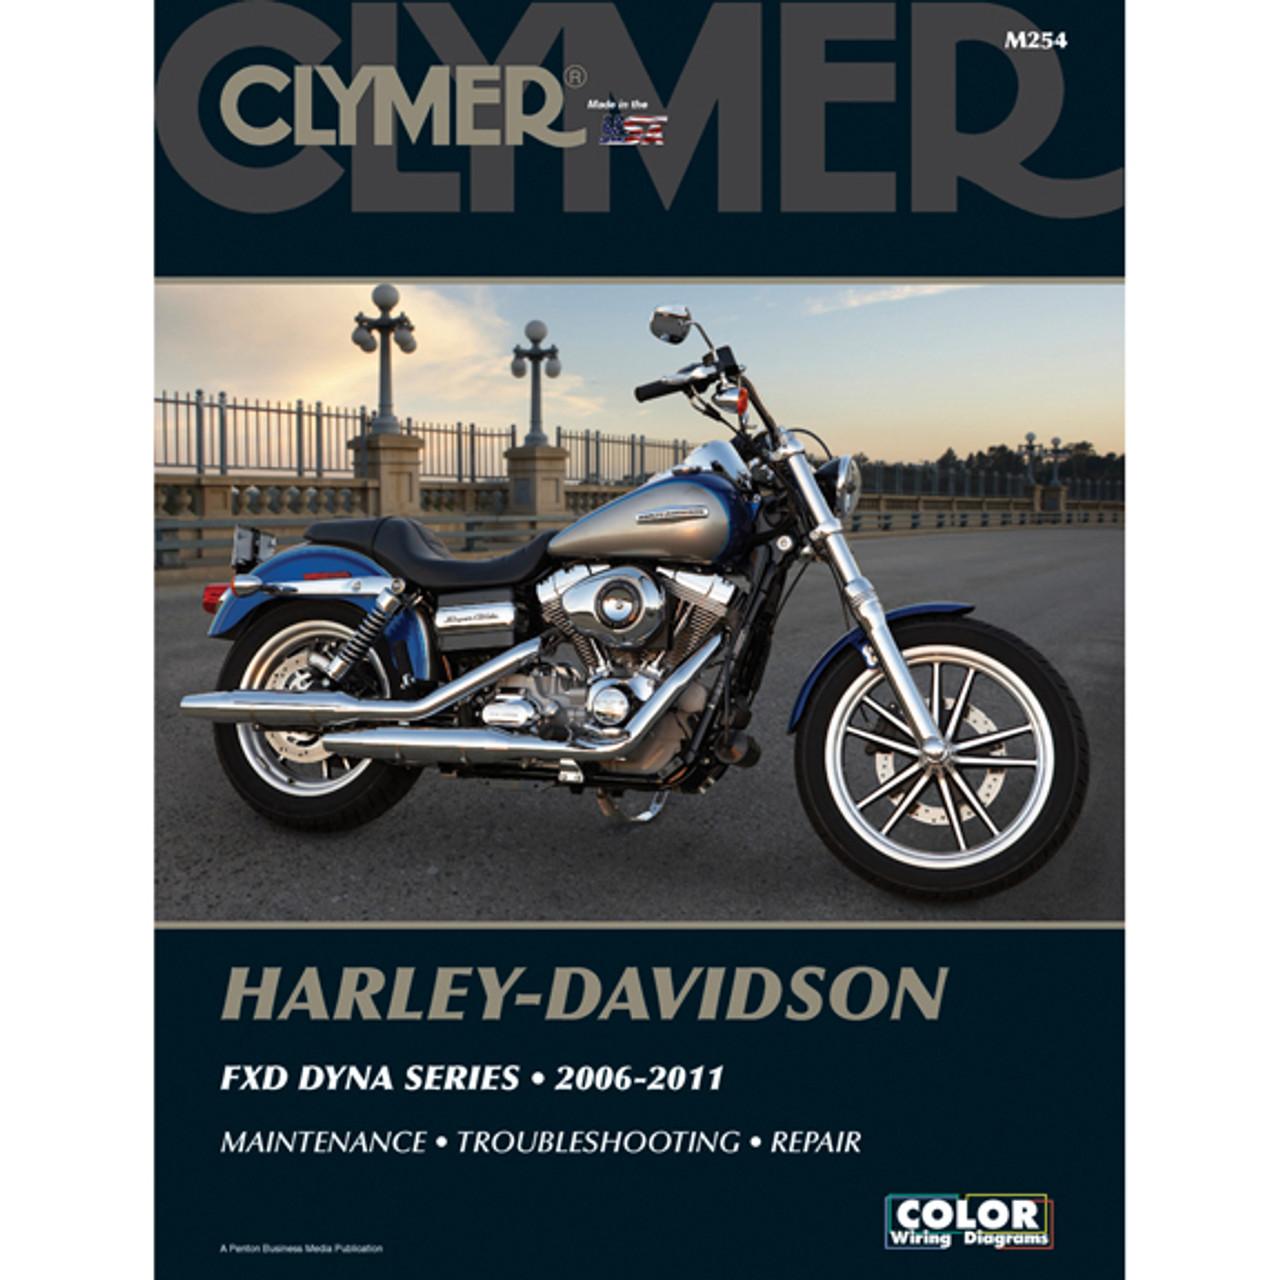 clymer m254 service shop repair manual harley davidson fxd dyna rh speedaddicts com 2009 Harley FXDB 2009 Harley Street Bob